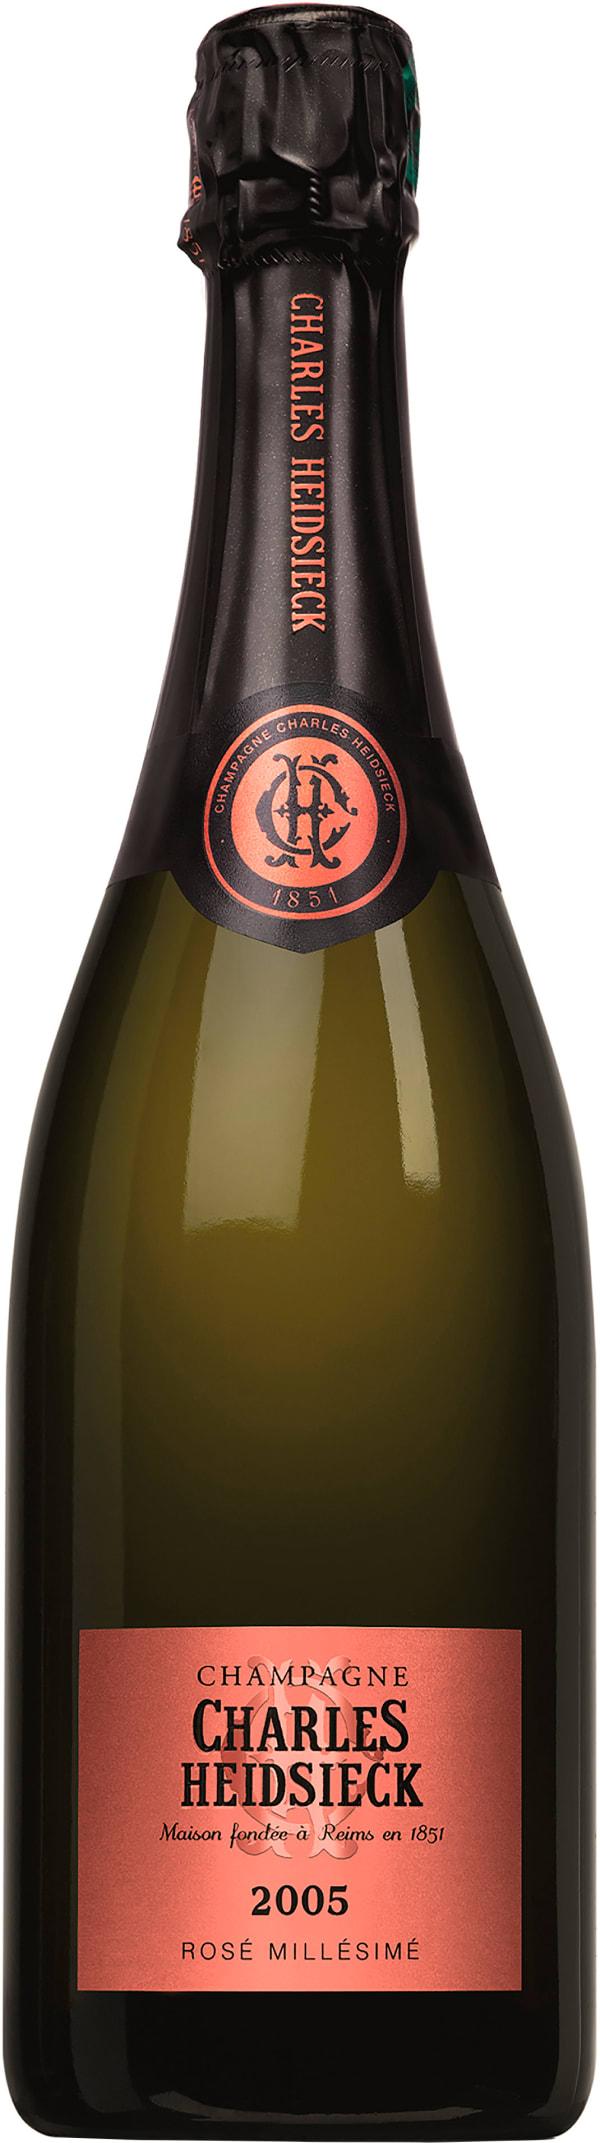 Charles Heidsieck Vintage Rosé Champagne Brut  2005